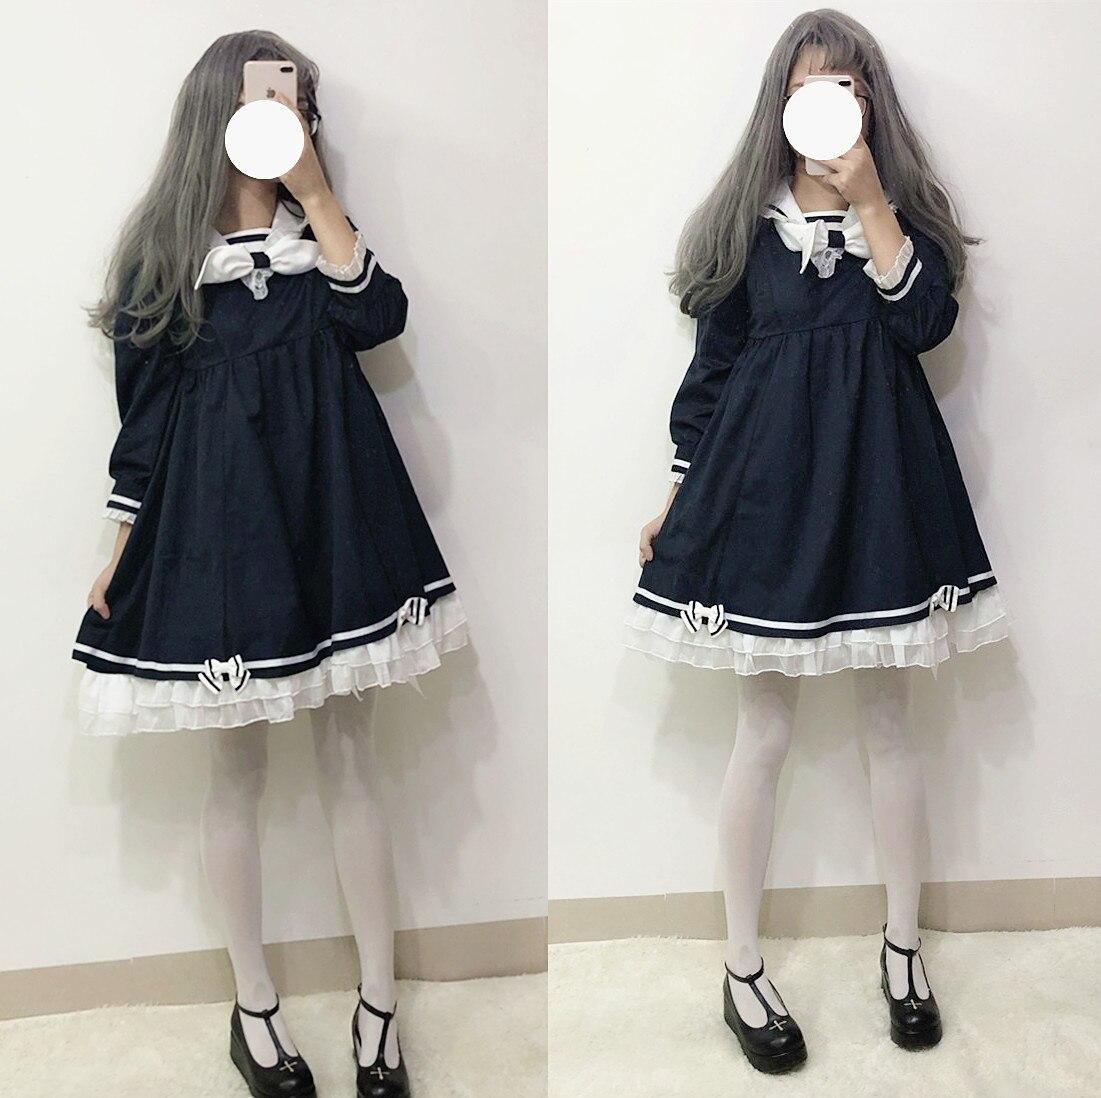 3739d5c6860 Arc Lolita Doux Robe Kawaii Belle Marine Volants Robes Fille Japonais Marin  Sœur Dress Mode Dentelle ...